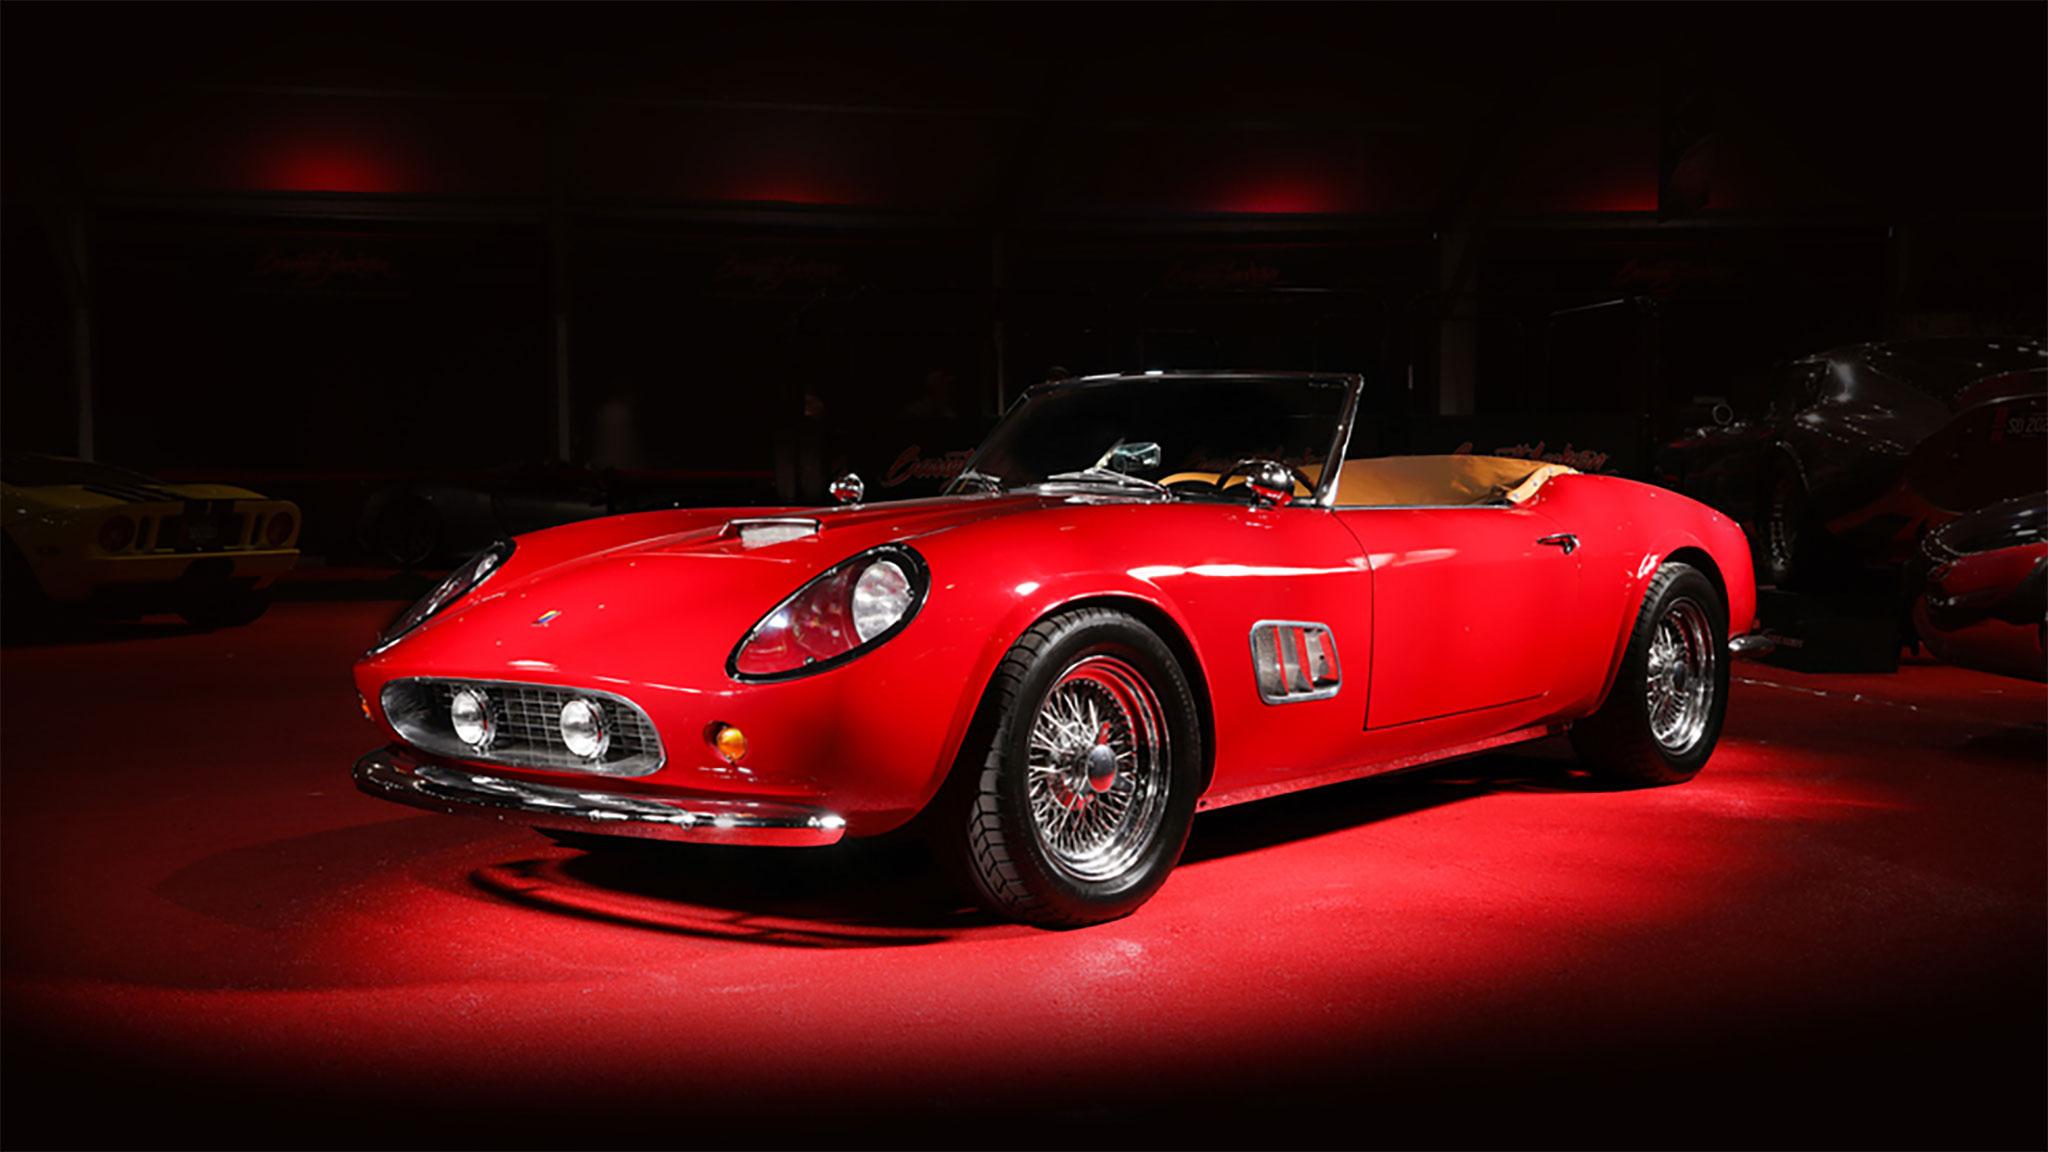 Ferris Bueller Ferrari California Spyder Replica Sells For Nearly $400,000